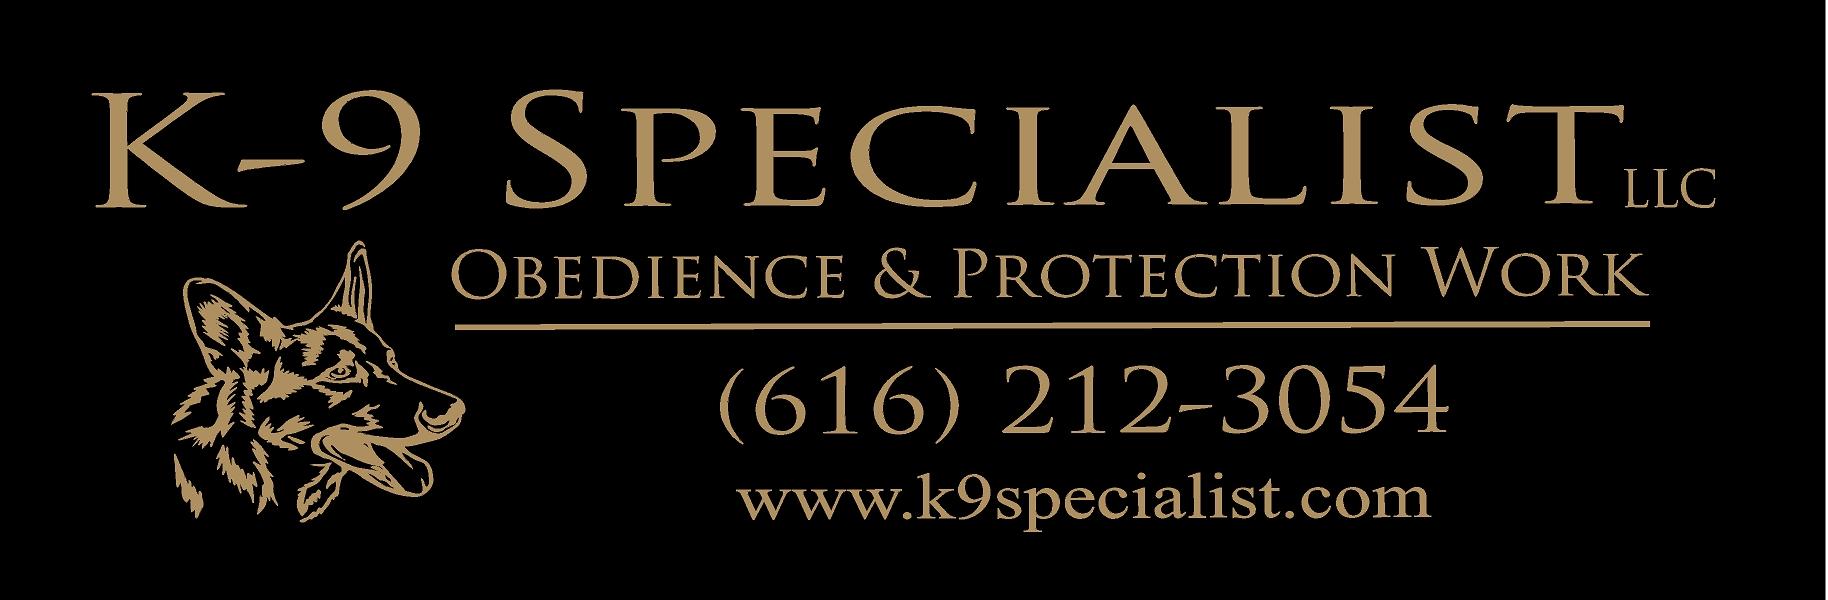 K-9 Specialist